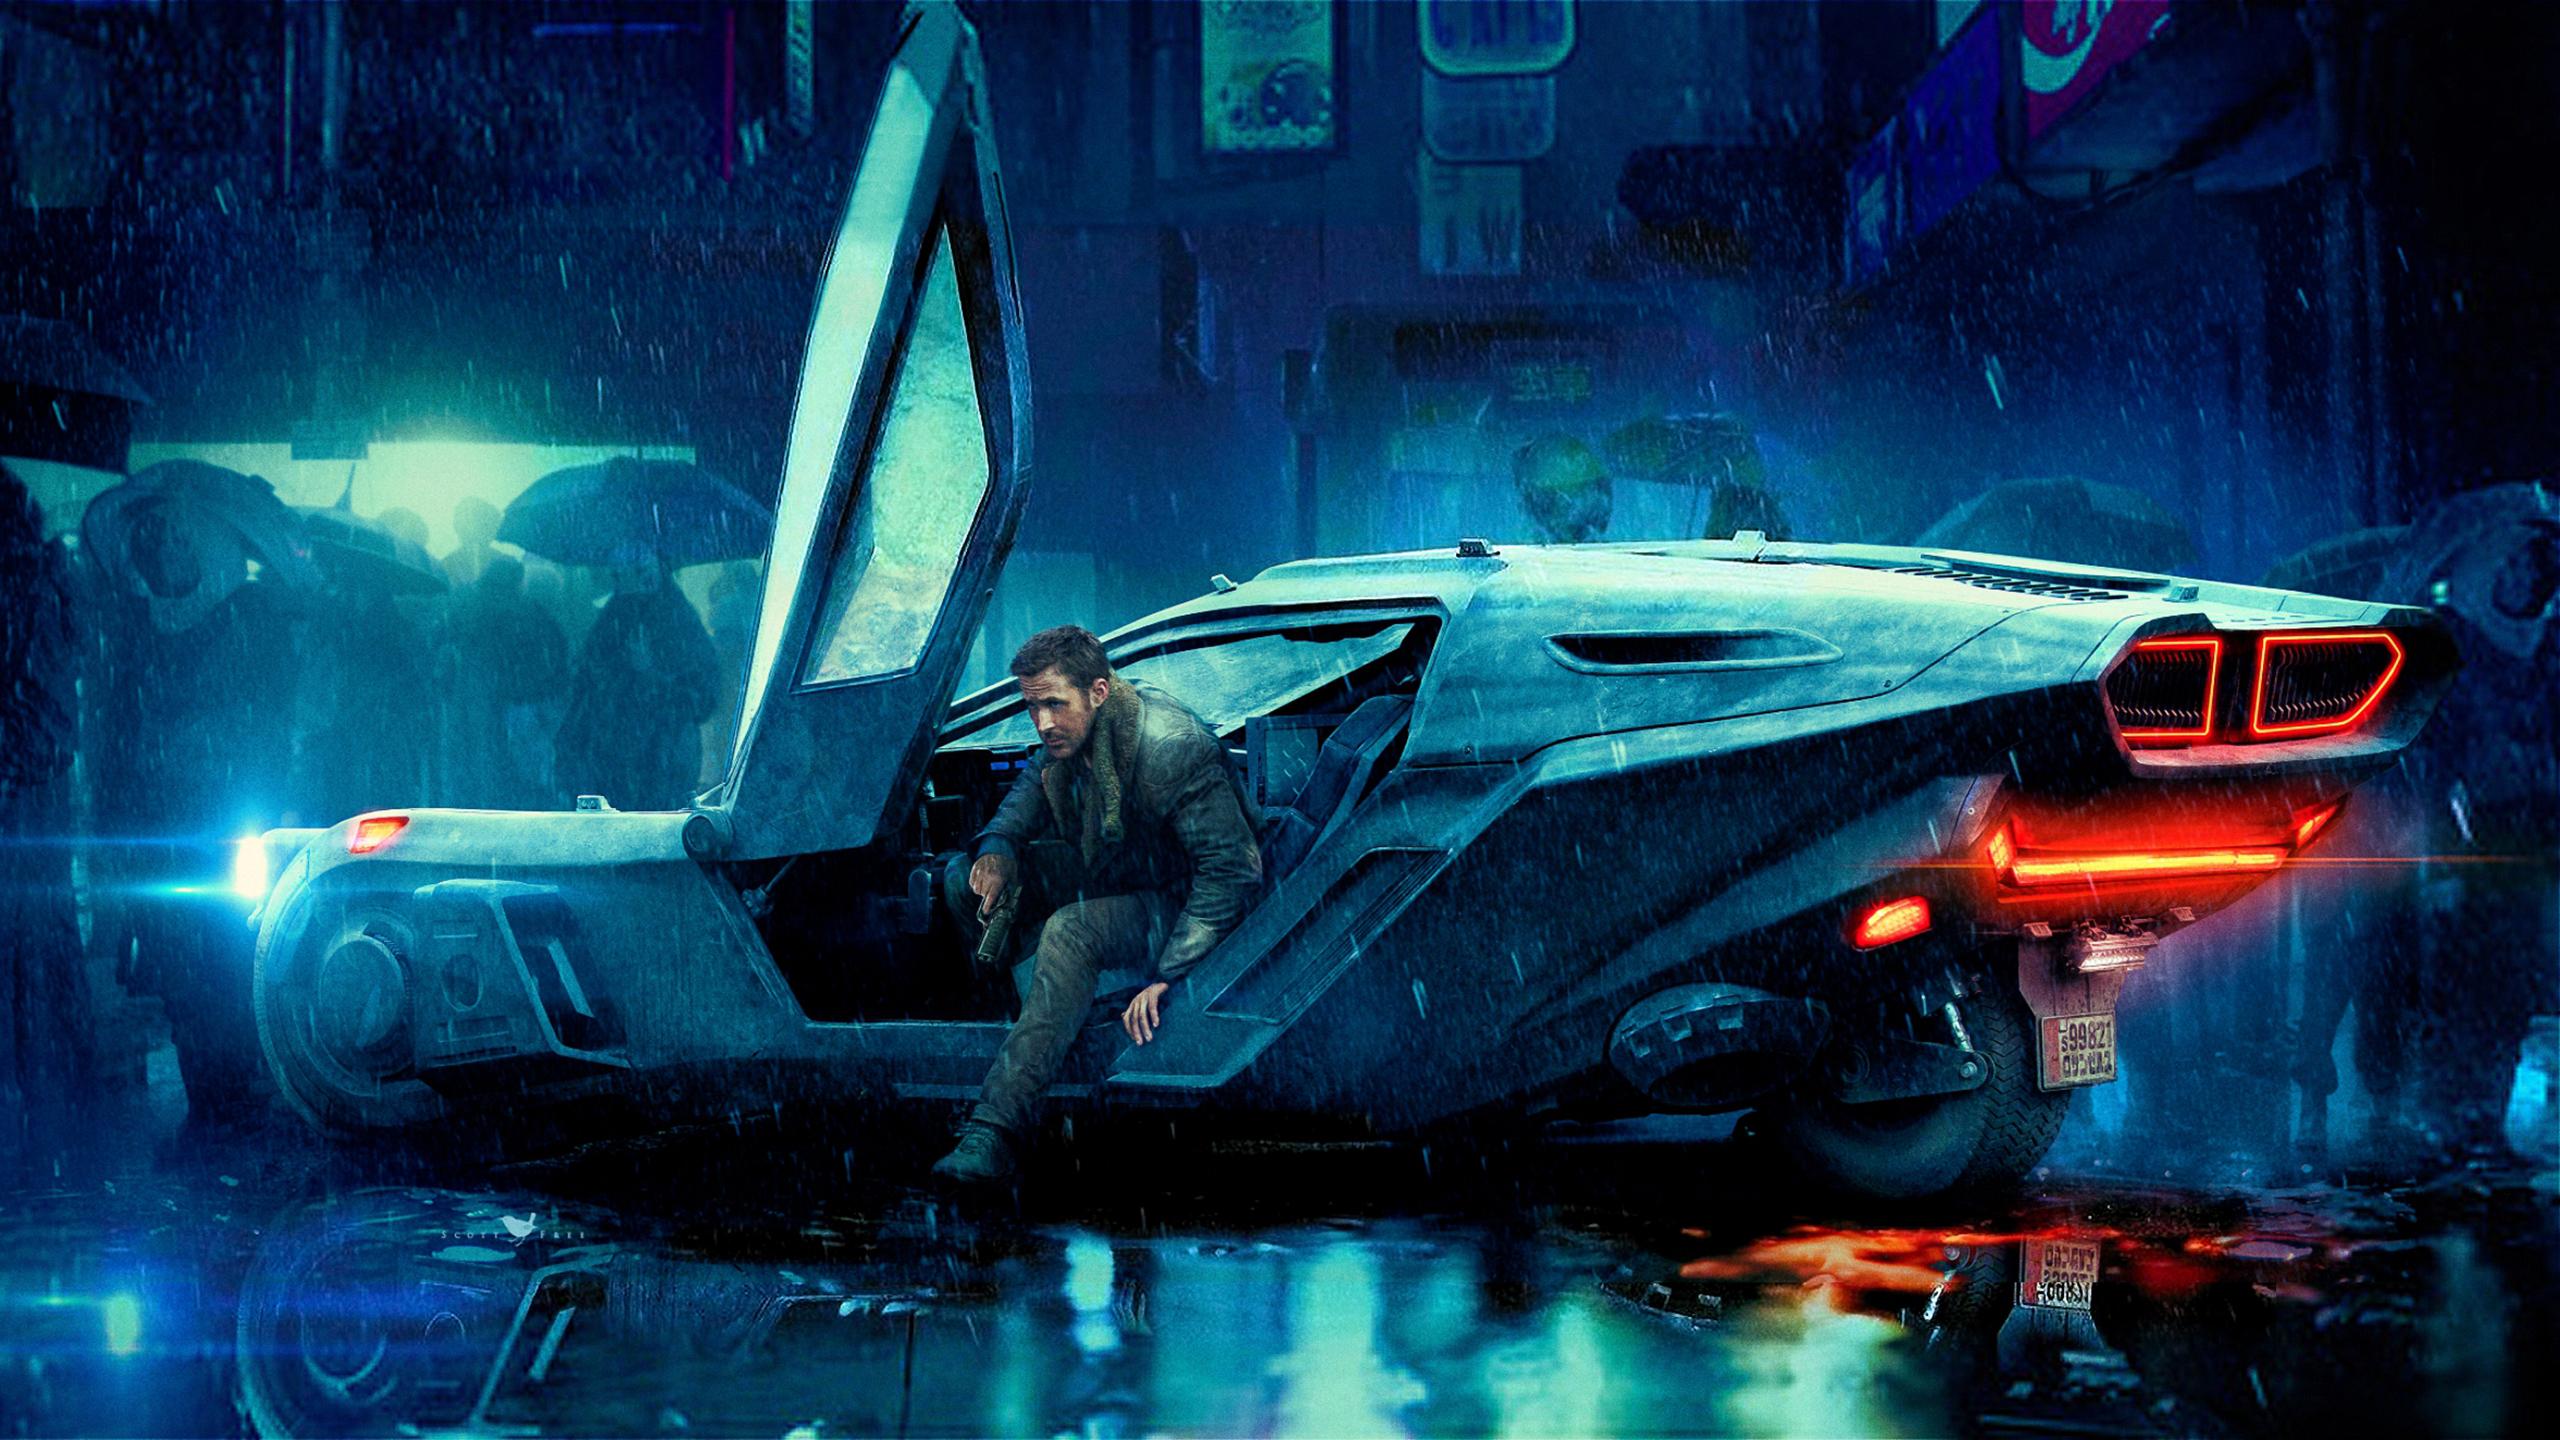 Blade Runner 2049 Wallpapers Hd Wallpapers